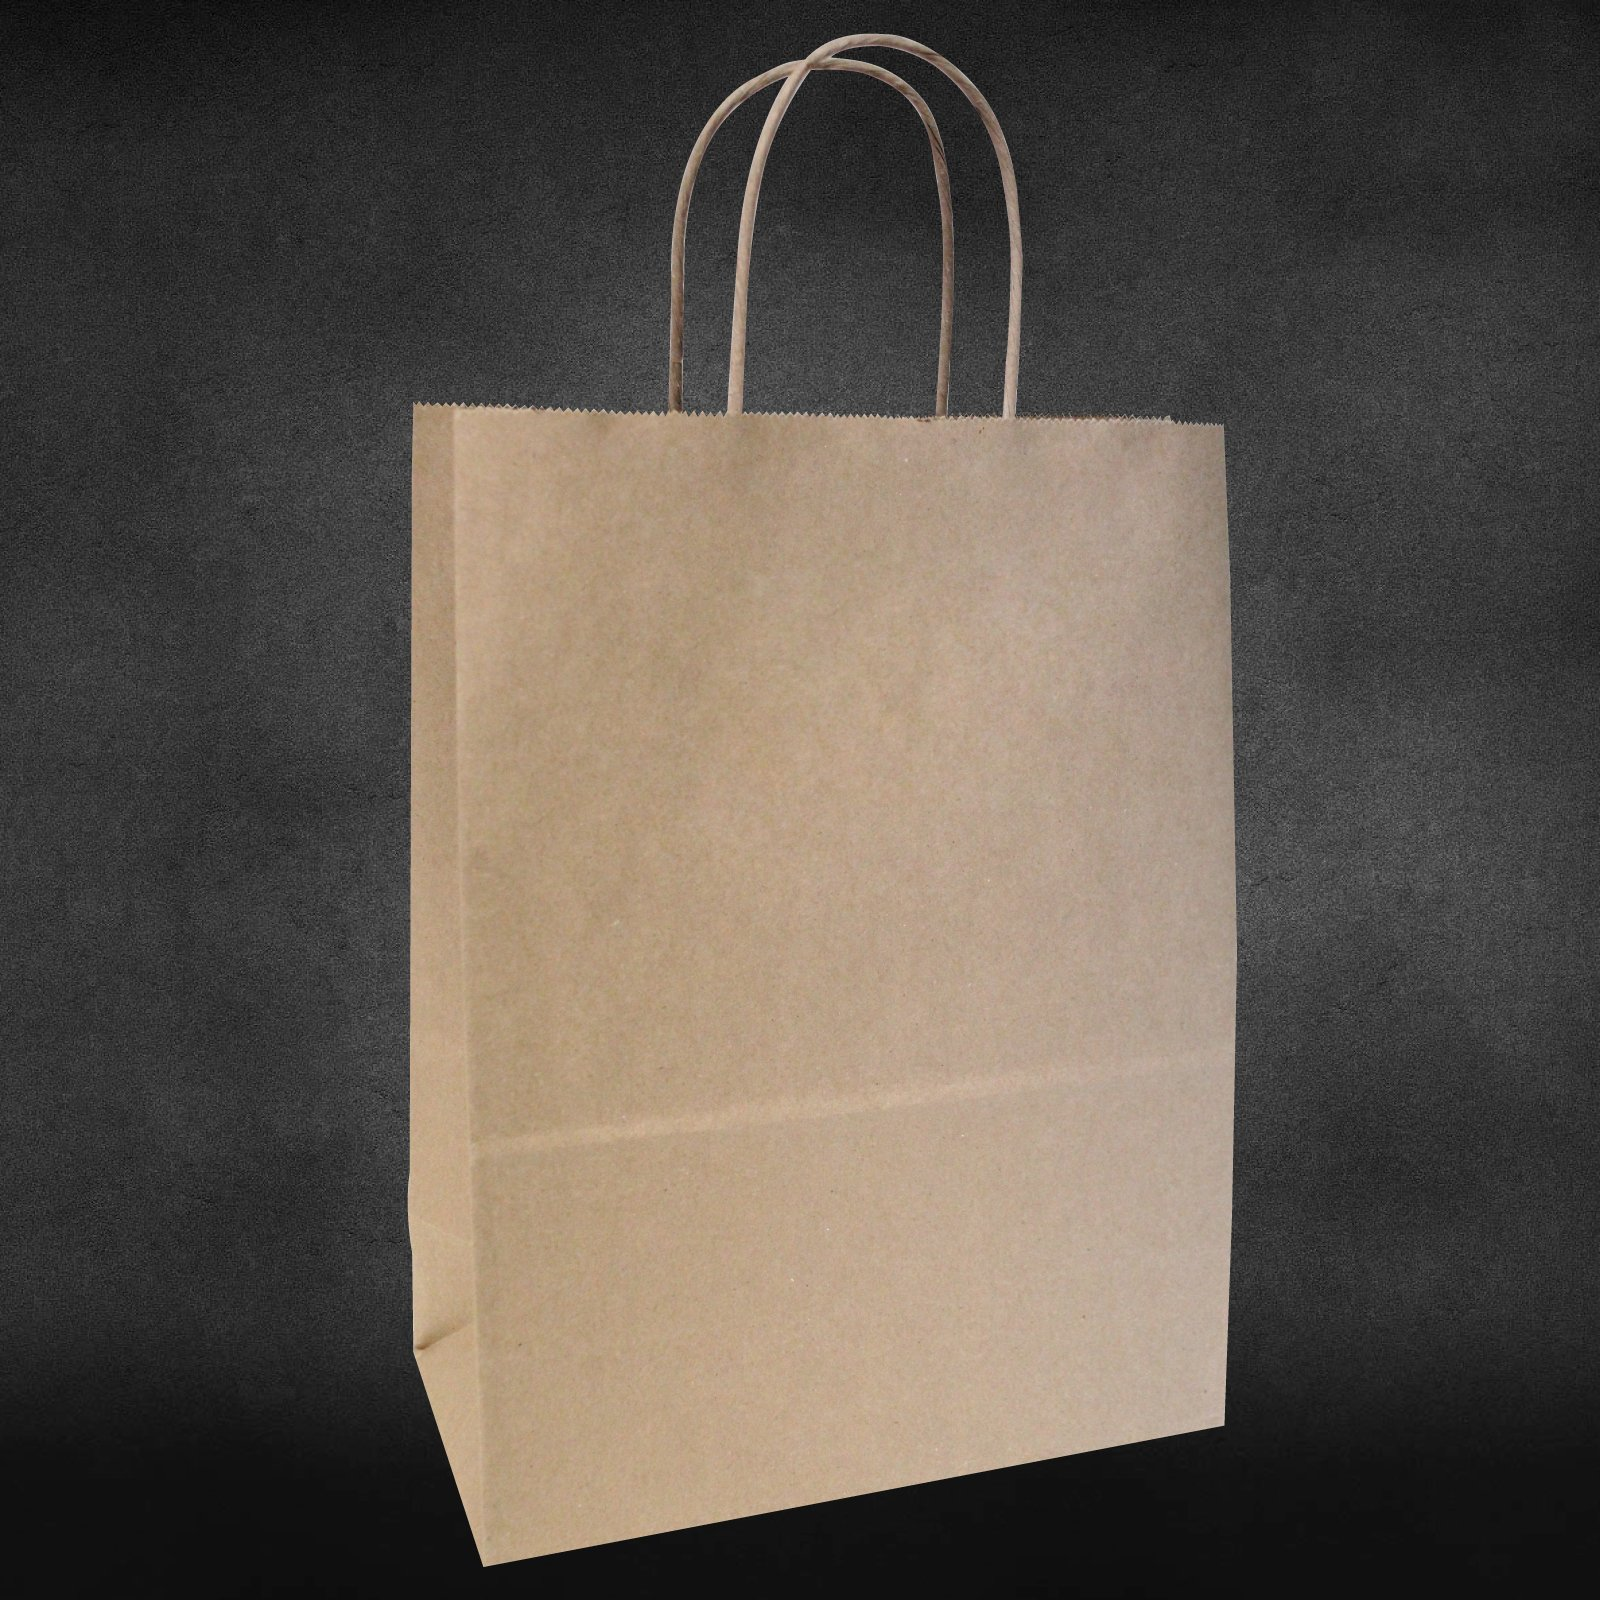 10''x5''x13'' - 100 Pcs - Bagsource Brown Kraft Paper Bags,95% POST CONSUMER MATERIALS & FSC CERTIFIED